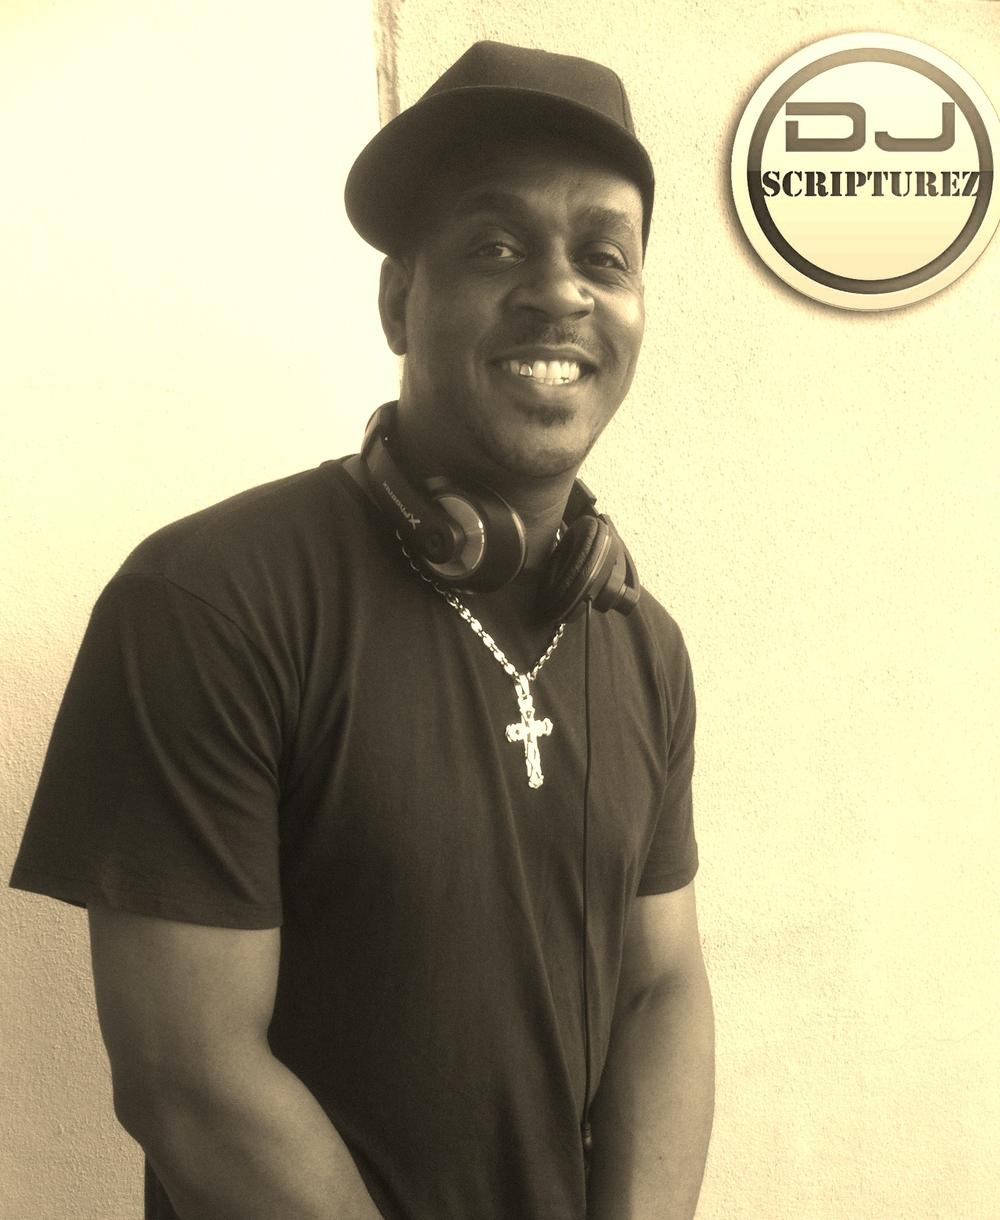 DJ SCRIPTUREZ